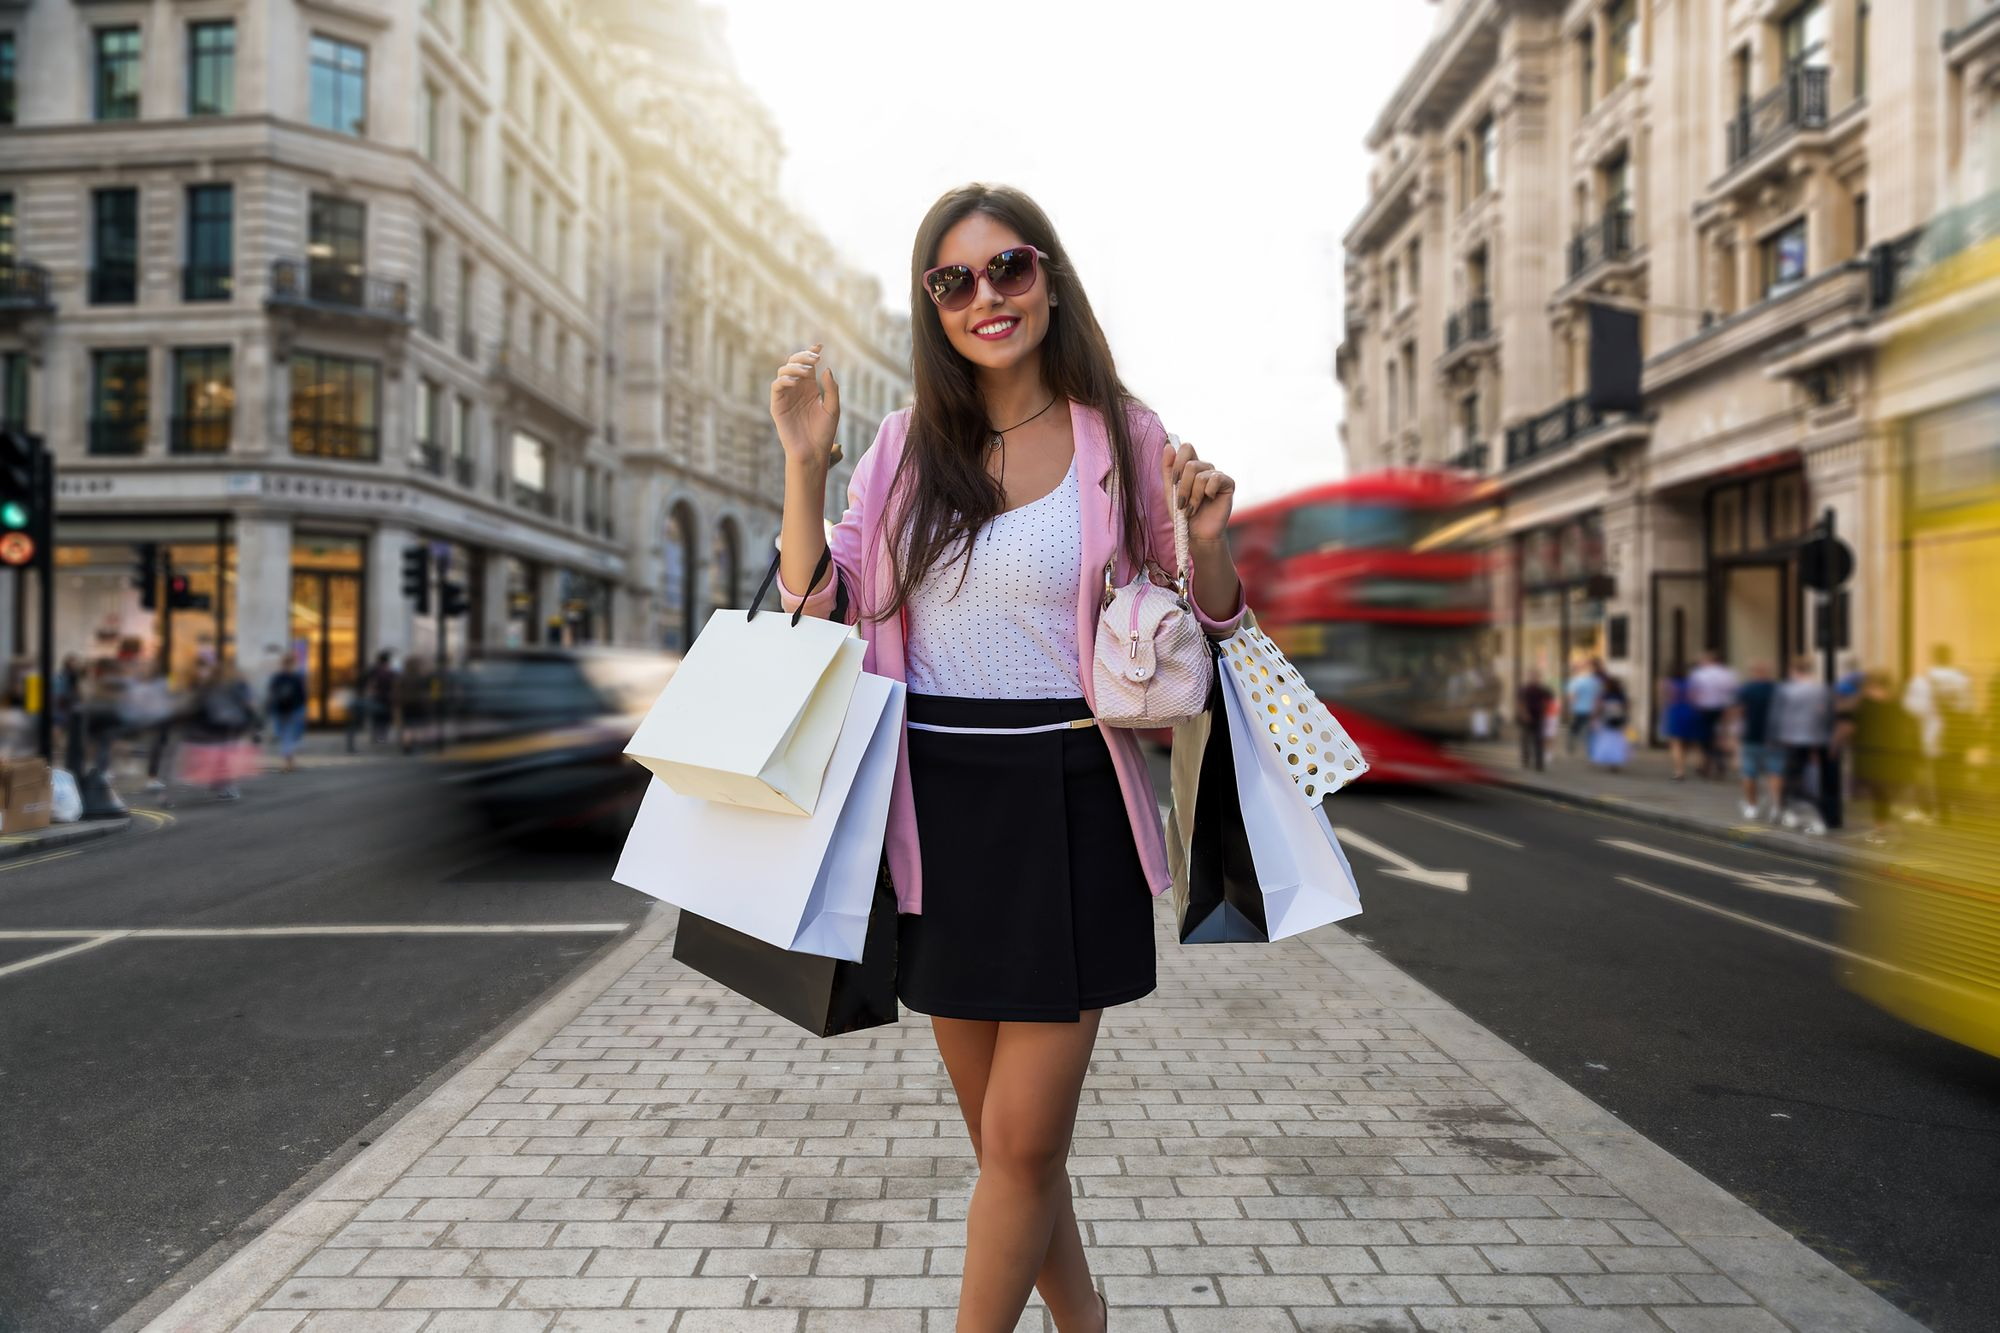 Die besten Shopping-Citys in Europa